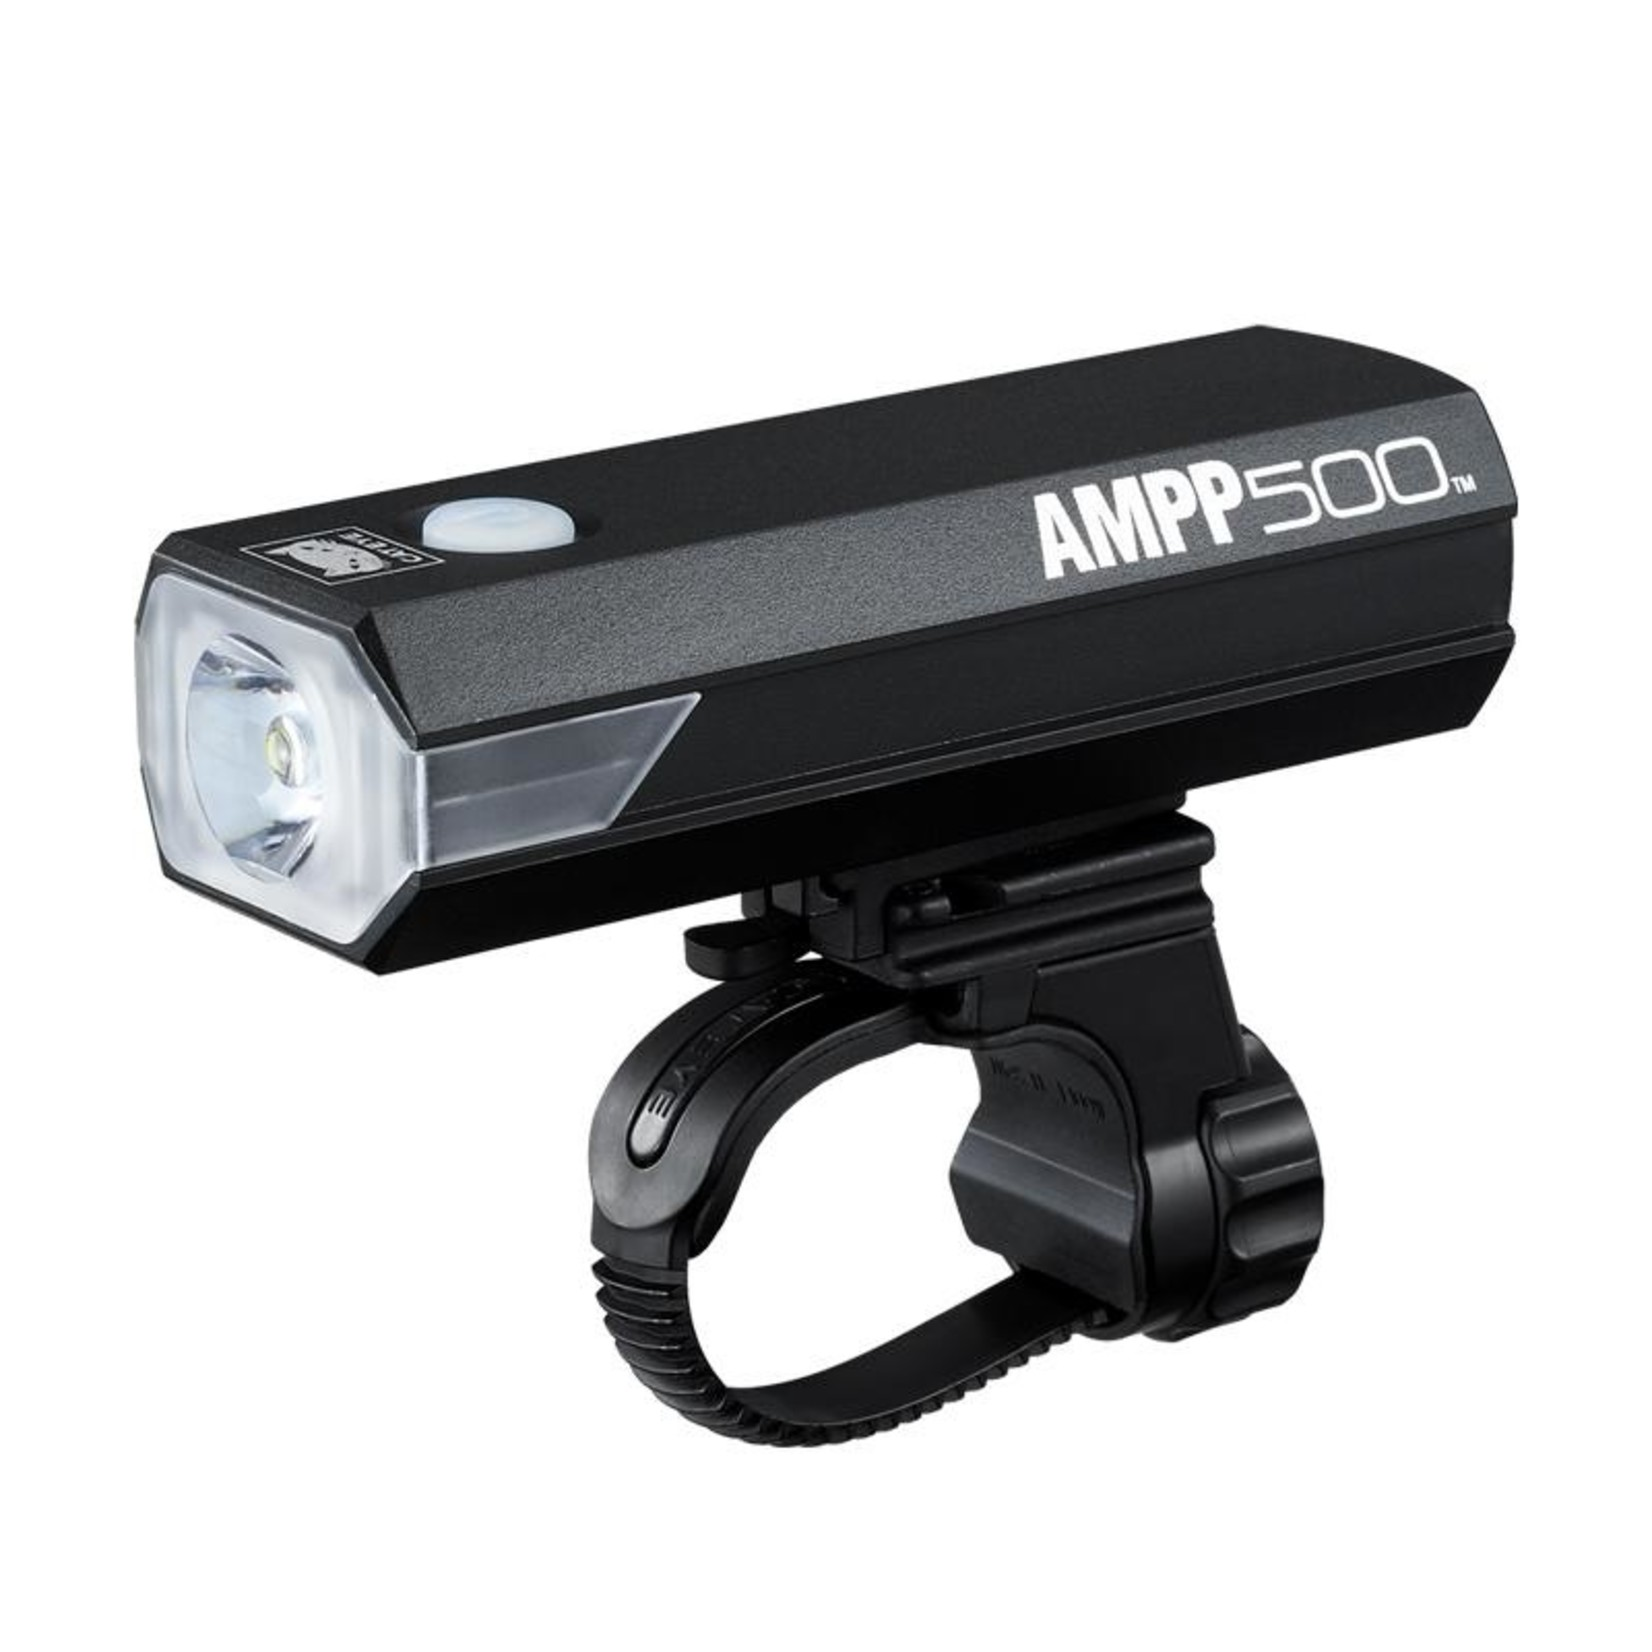 Cateye Cateye, Light Front Ampp 500 Black